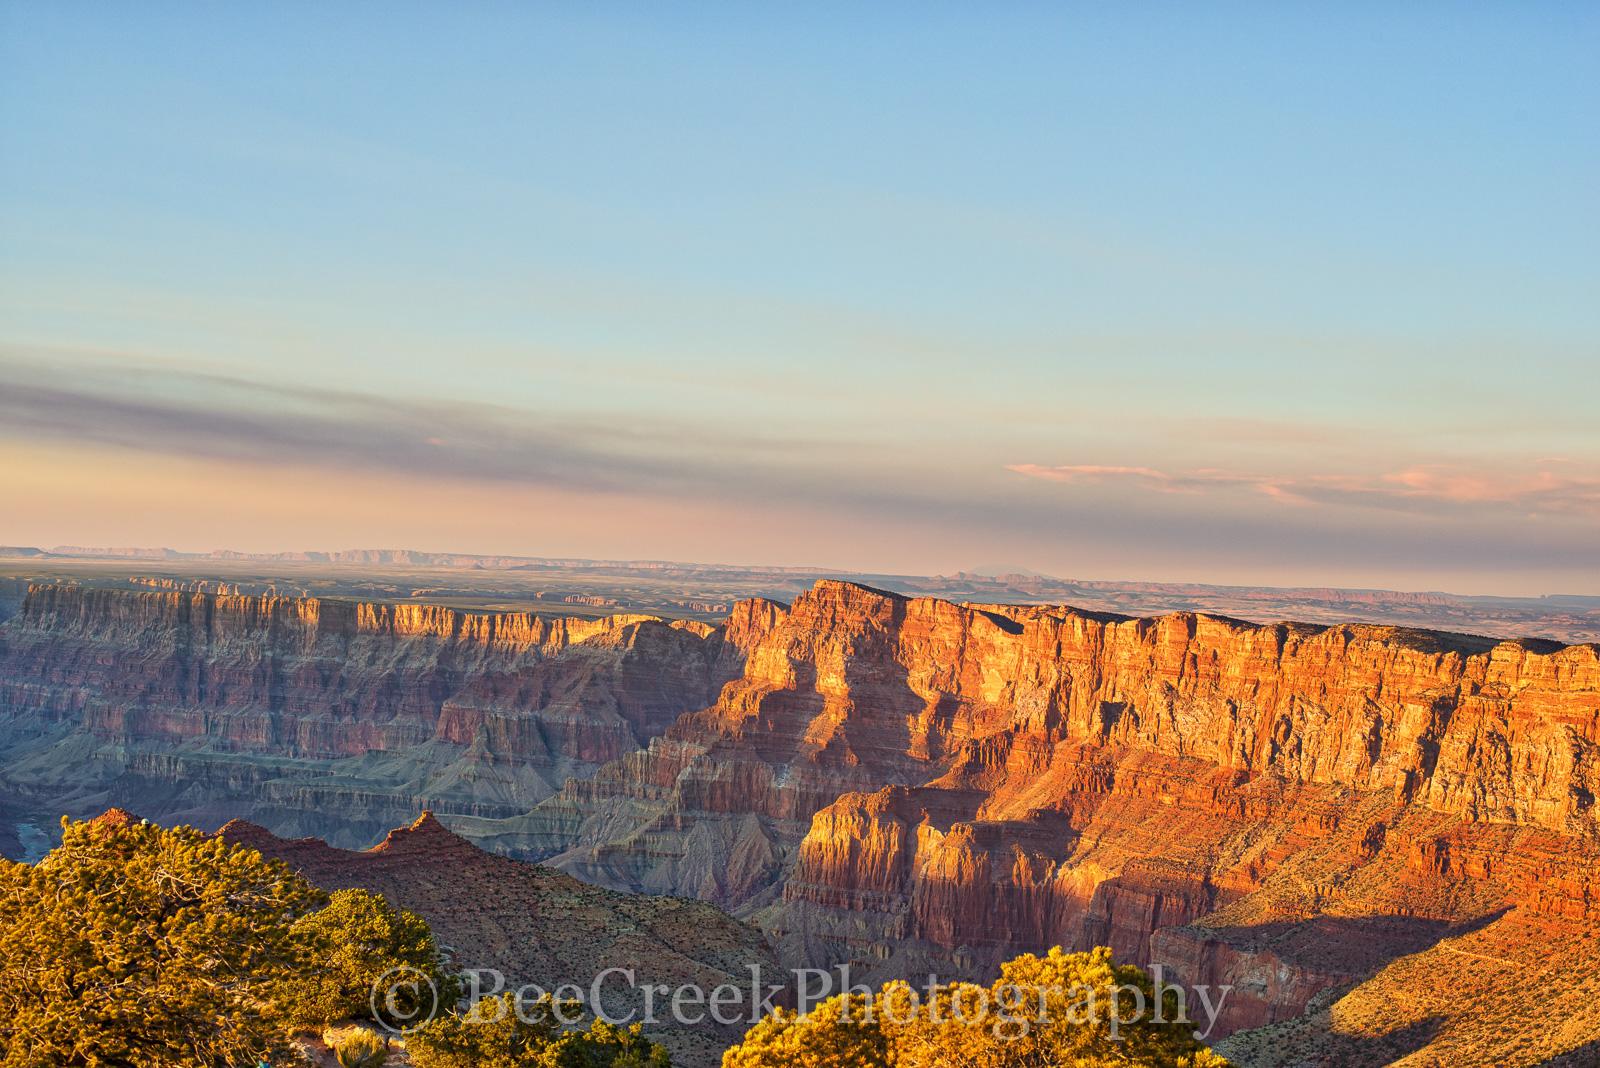 Arizona, Grand Canyon, Mountains, colroado river, desert, erooding, geologic, geology, glowing, golden, grand canyon images, grand canyon photos, grand canyon pictures, images of grand canyons, landsc, photo